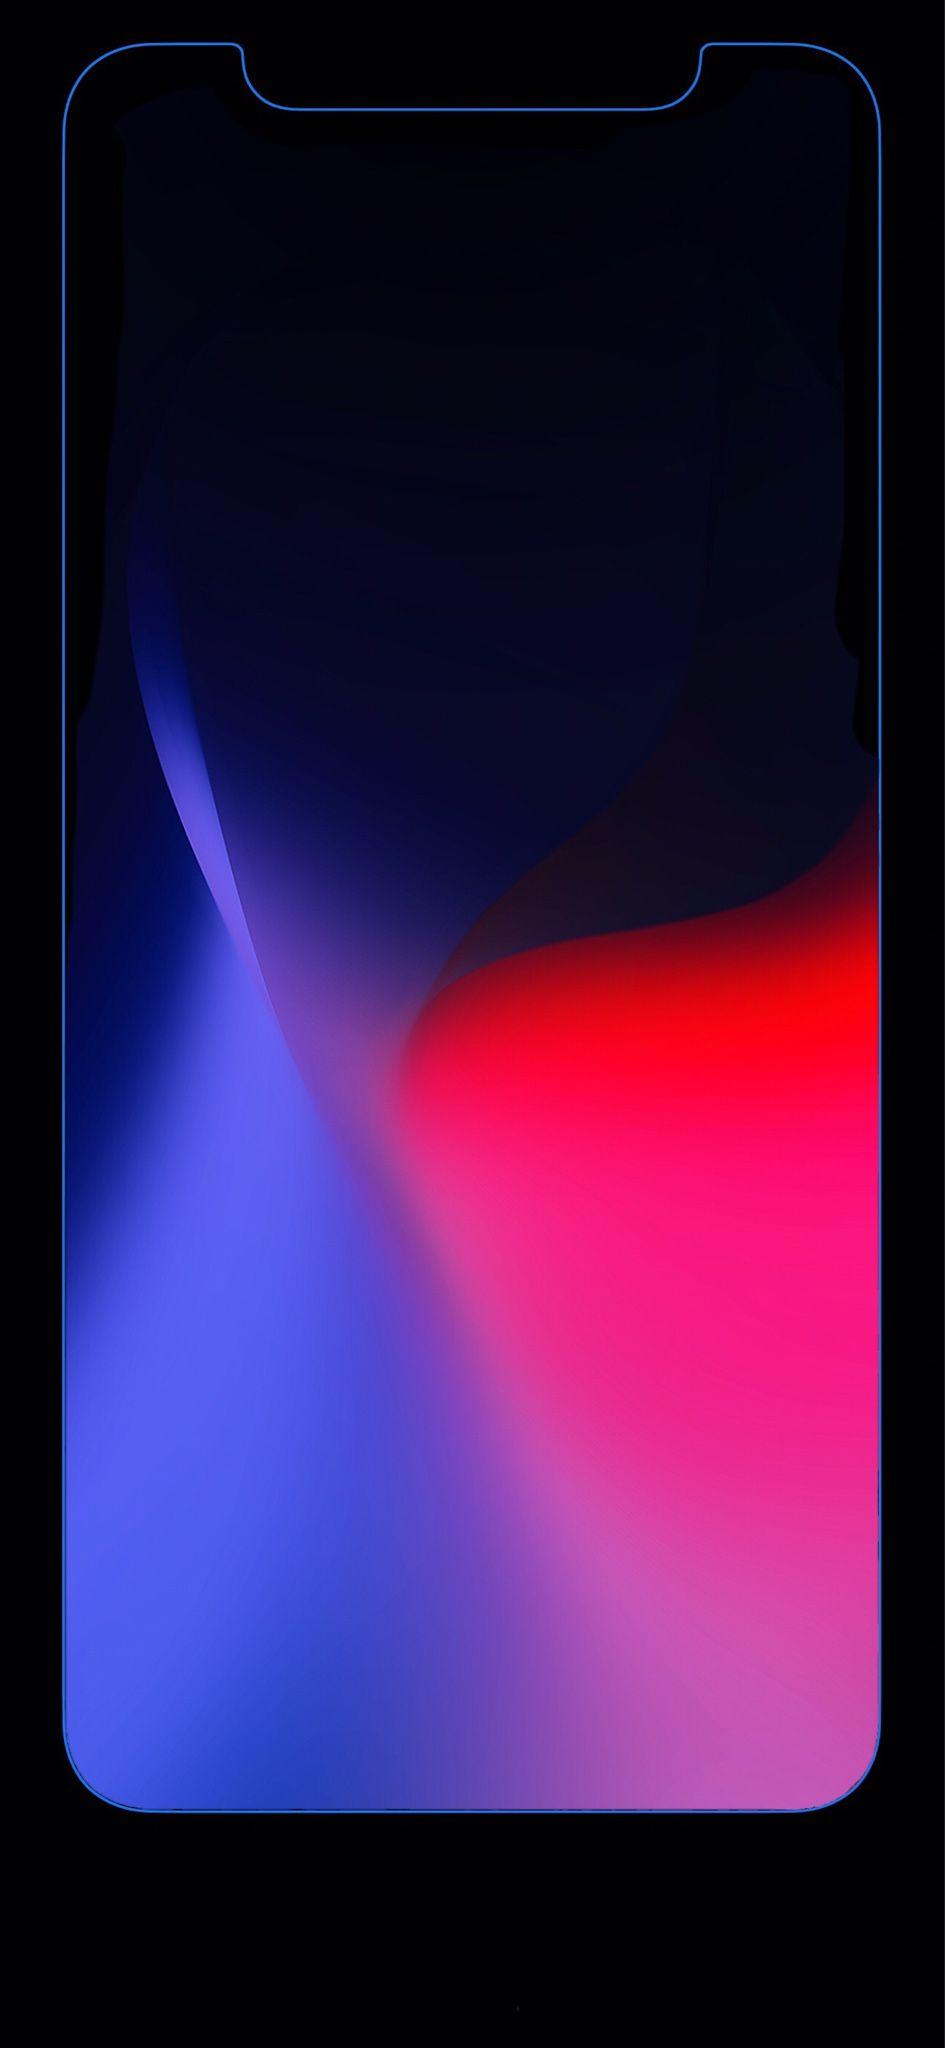 Gentle Black Wallpaper For Iphone X Saving Battery Black Wallpaper Apple Wallpaper Wallpaper